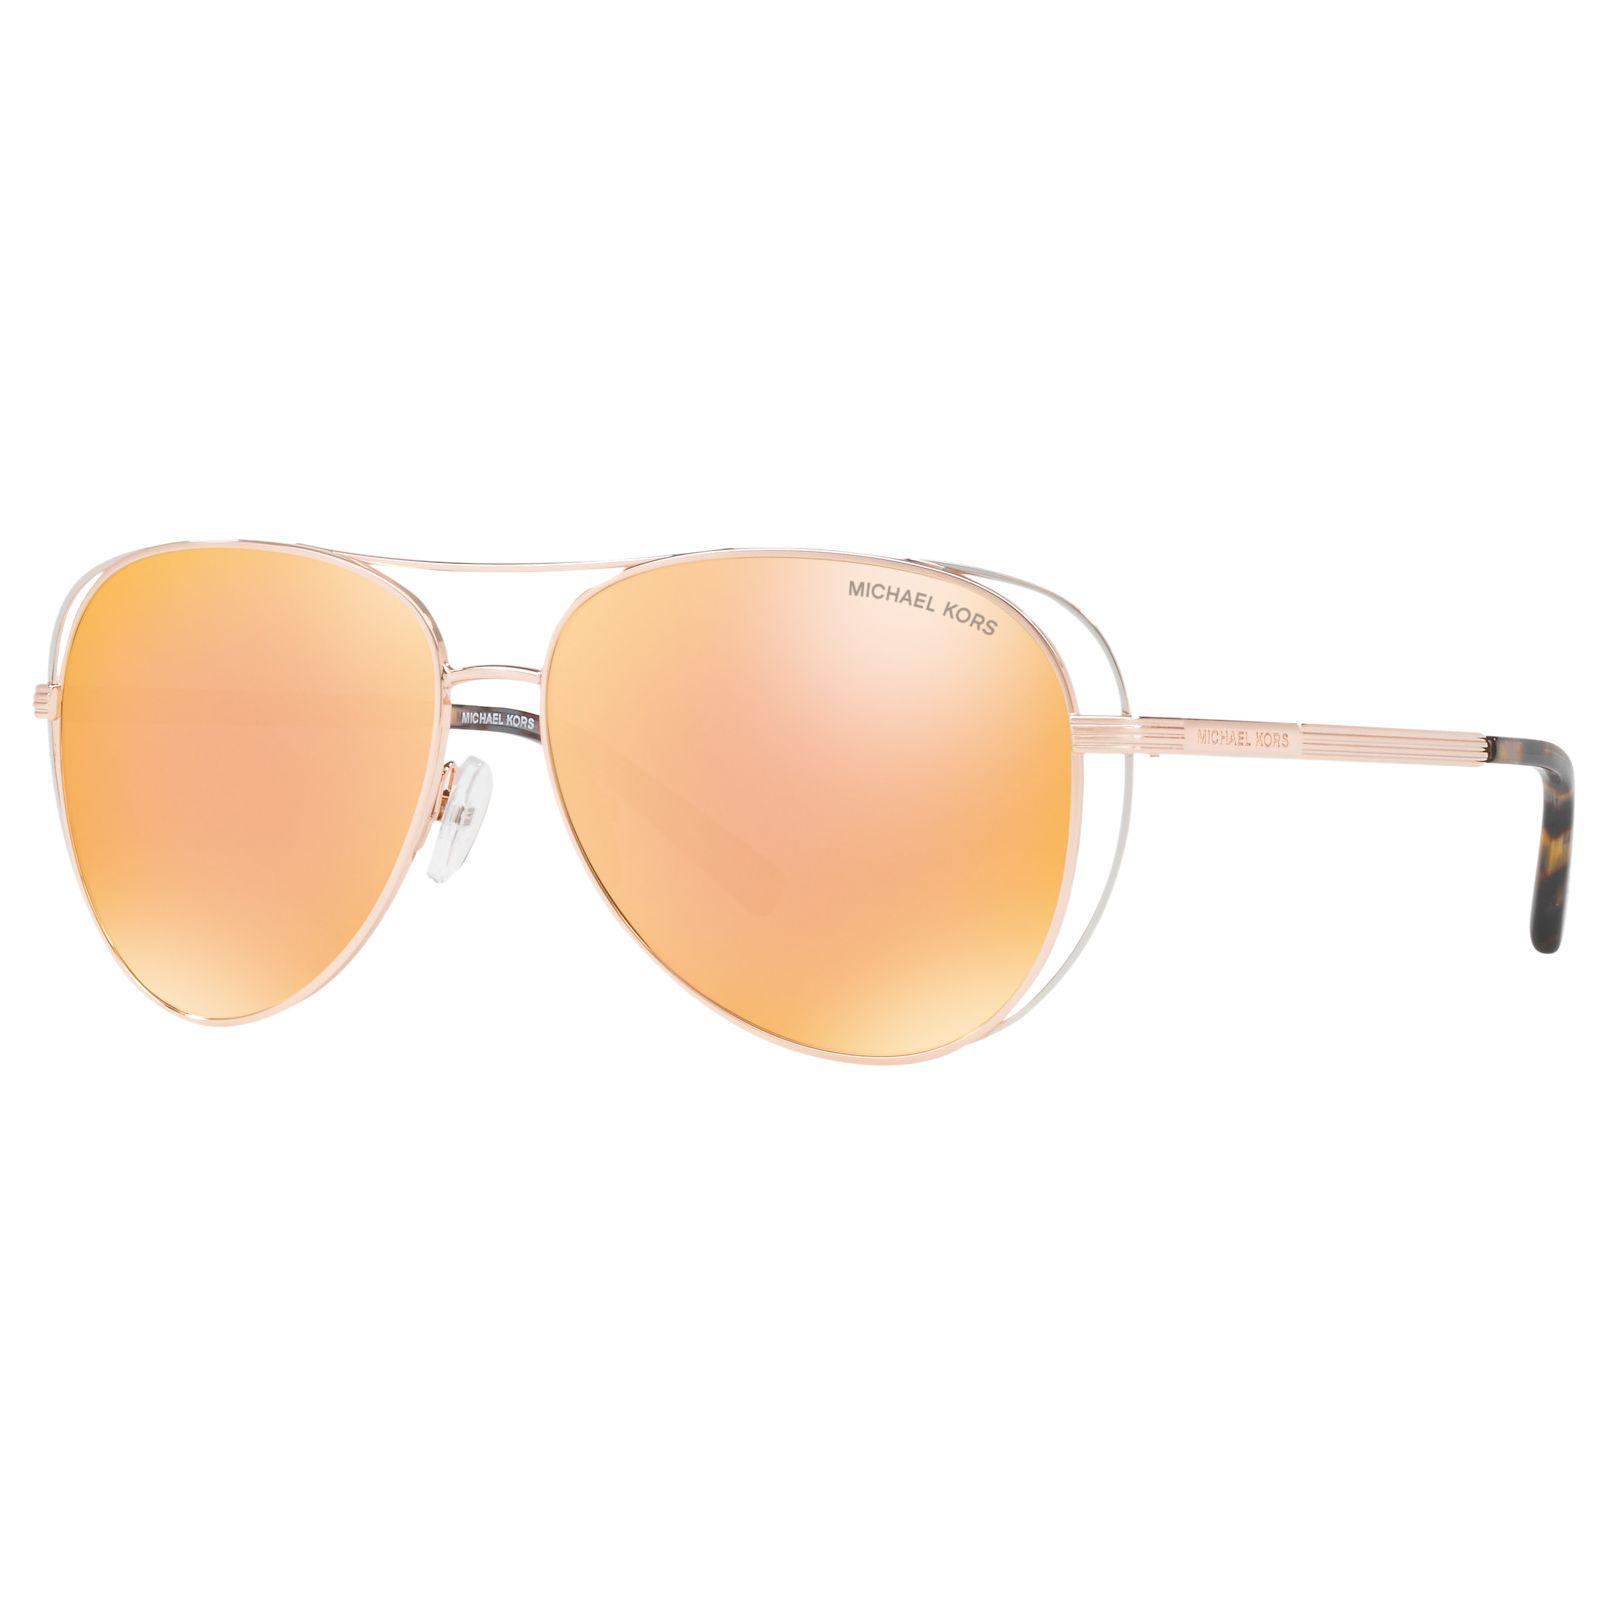 7f68f7c2bd Michael Kors - Metallic Mk1024 Lai Aviator Sunglasses - Lyst. View  fullscreen